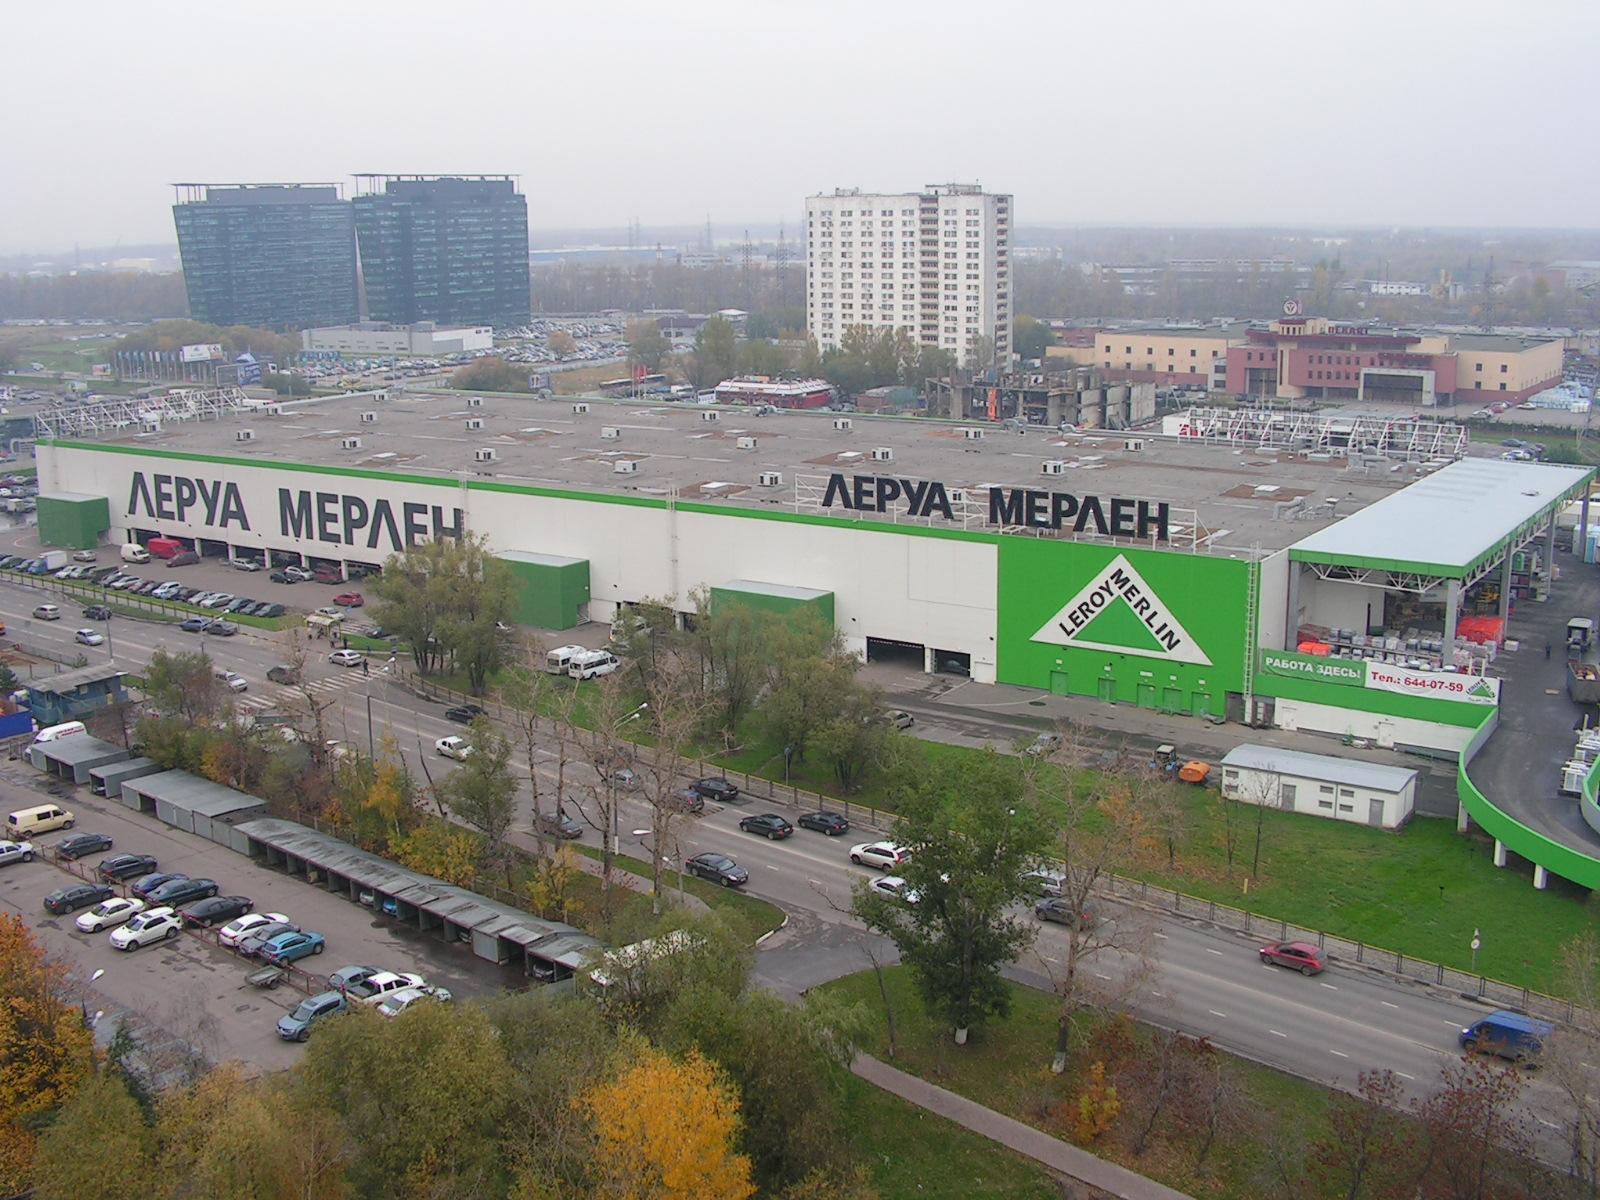 Леруа Мерлен , строительные и ...: wikimapia.org/10127511/ru/Гипермаркет-«Леруа...